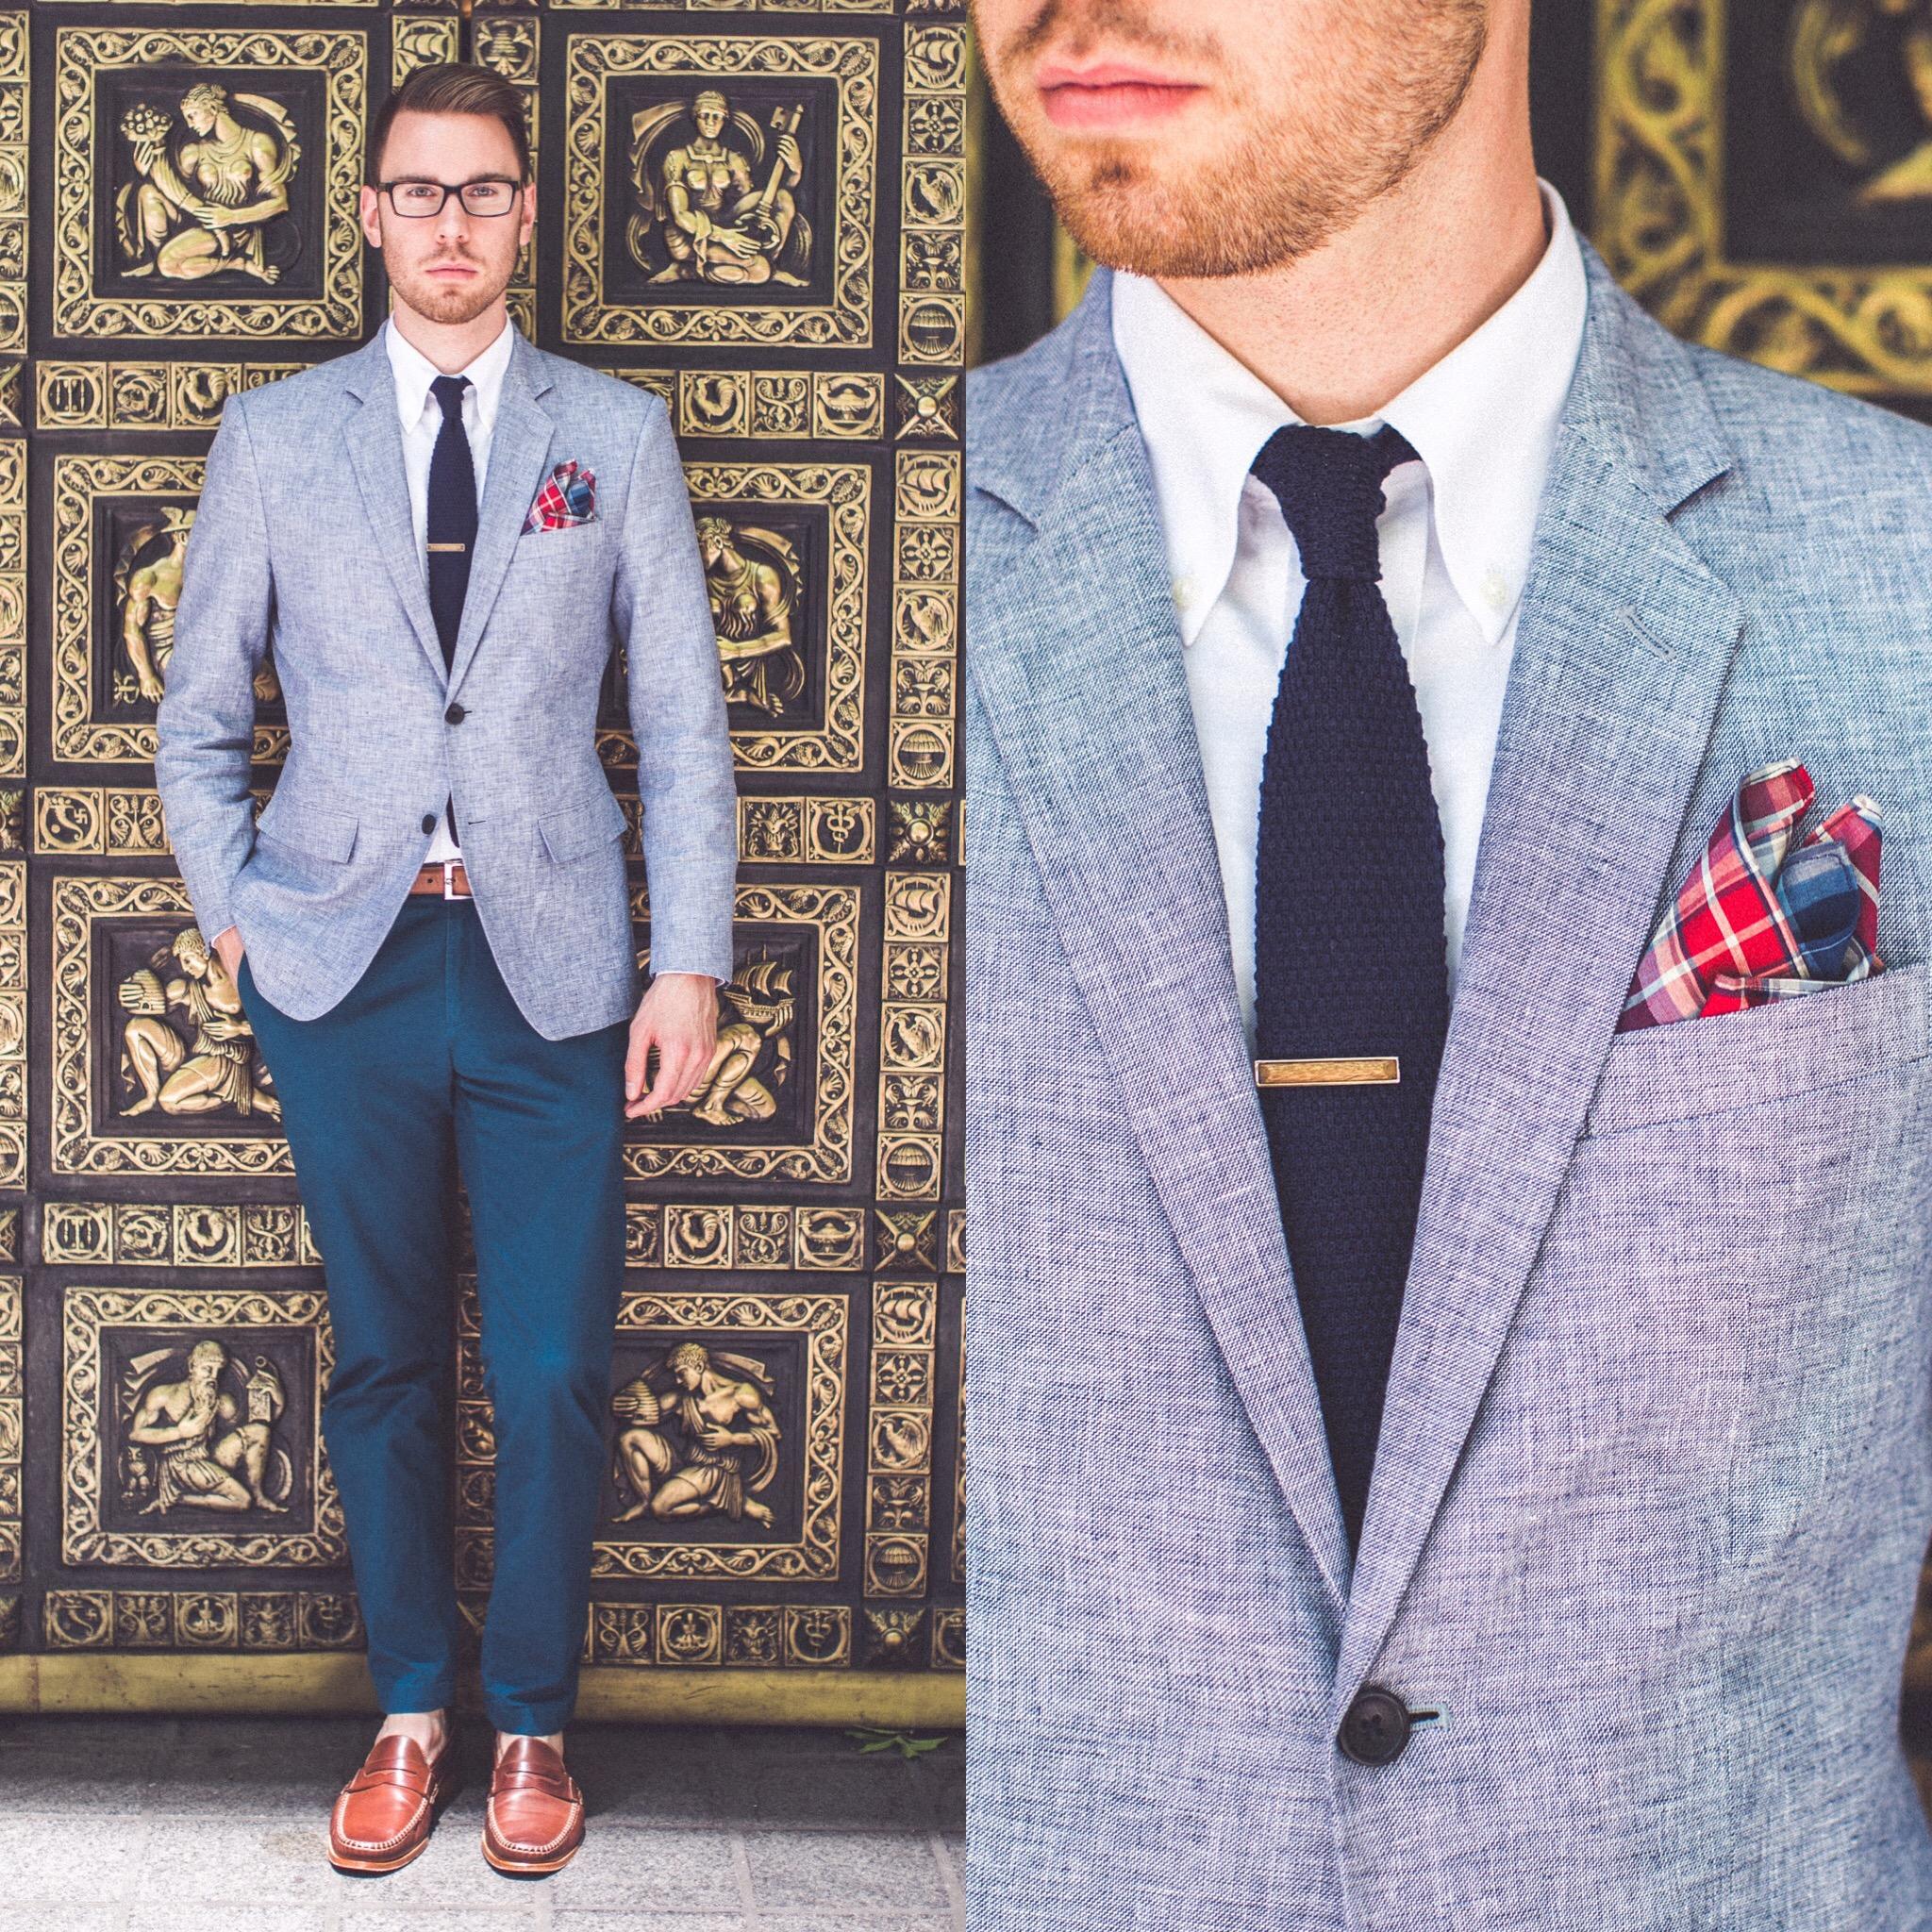 Pants: Brooks Brothers Red Fleece, Shirt: Brooks Brothers, Blazer:Banana Republic, Tie: Jcrew, Shoes: Johnston & Murphy, Pocket Square: bows-n-ties.com. Glasses: Burberry, Belt: Ralph Lauren